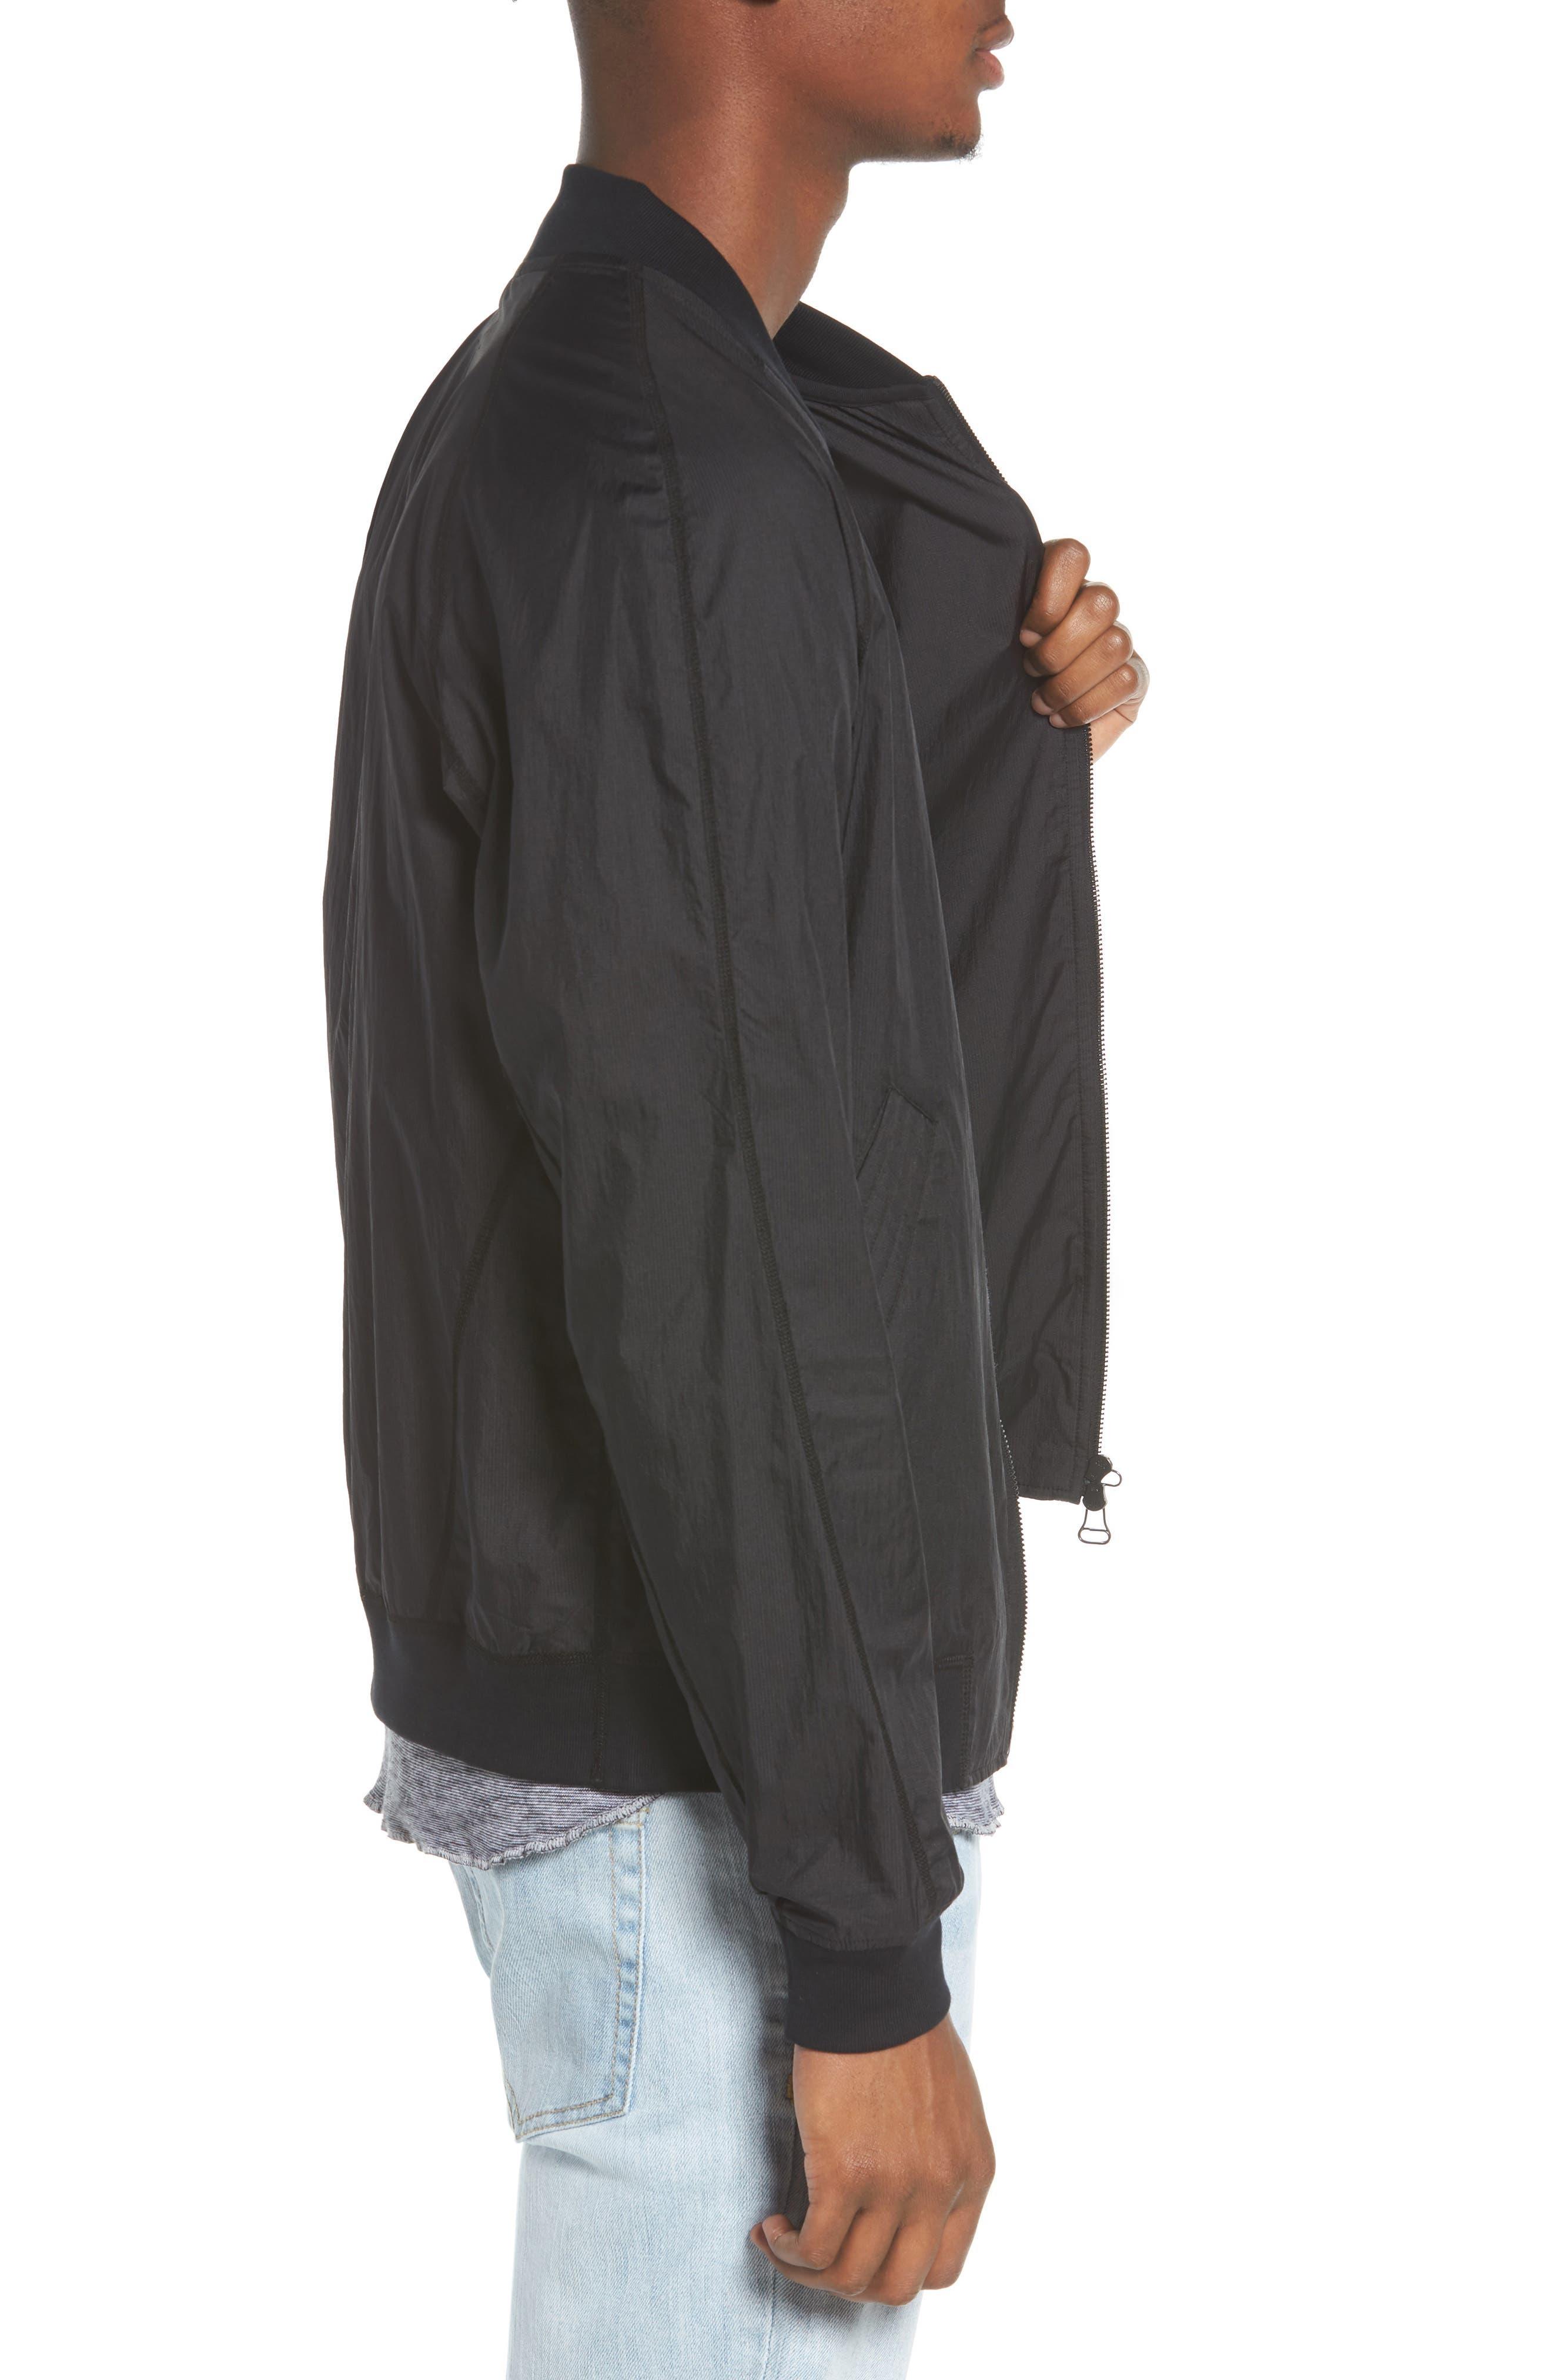 Souvenir Jacket,                             Alternate thumbnail 3, color,                             Black